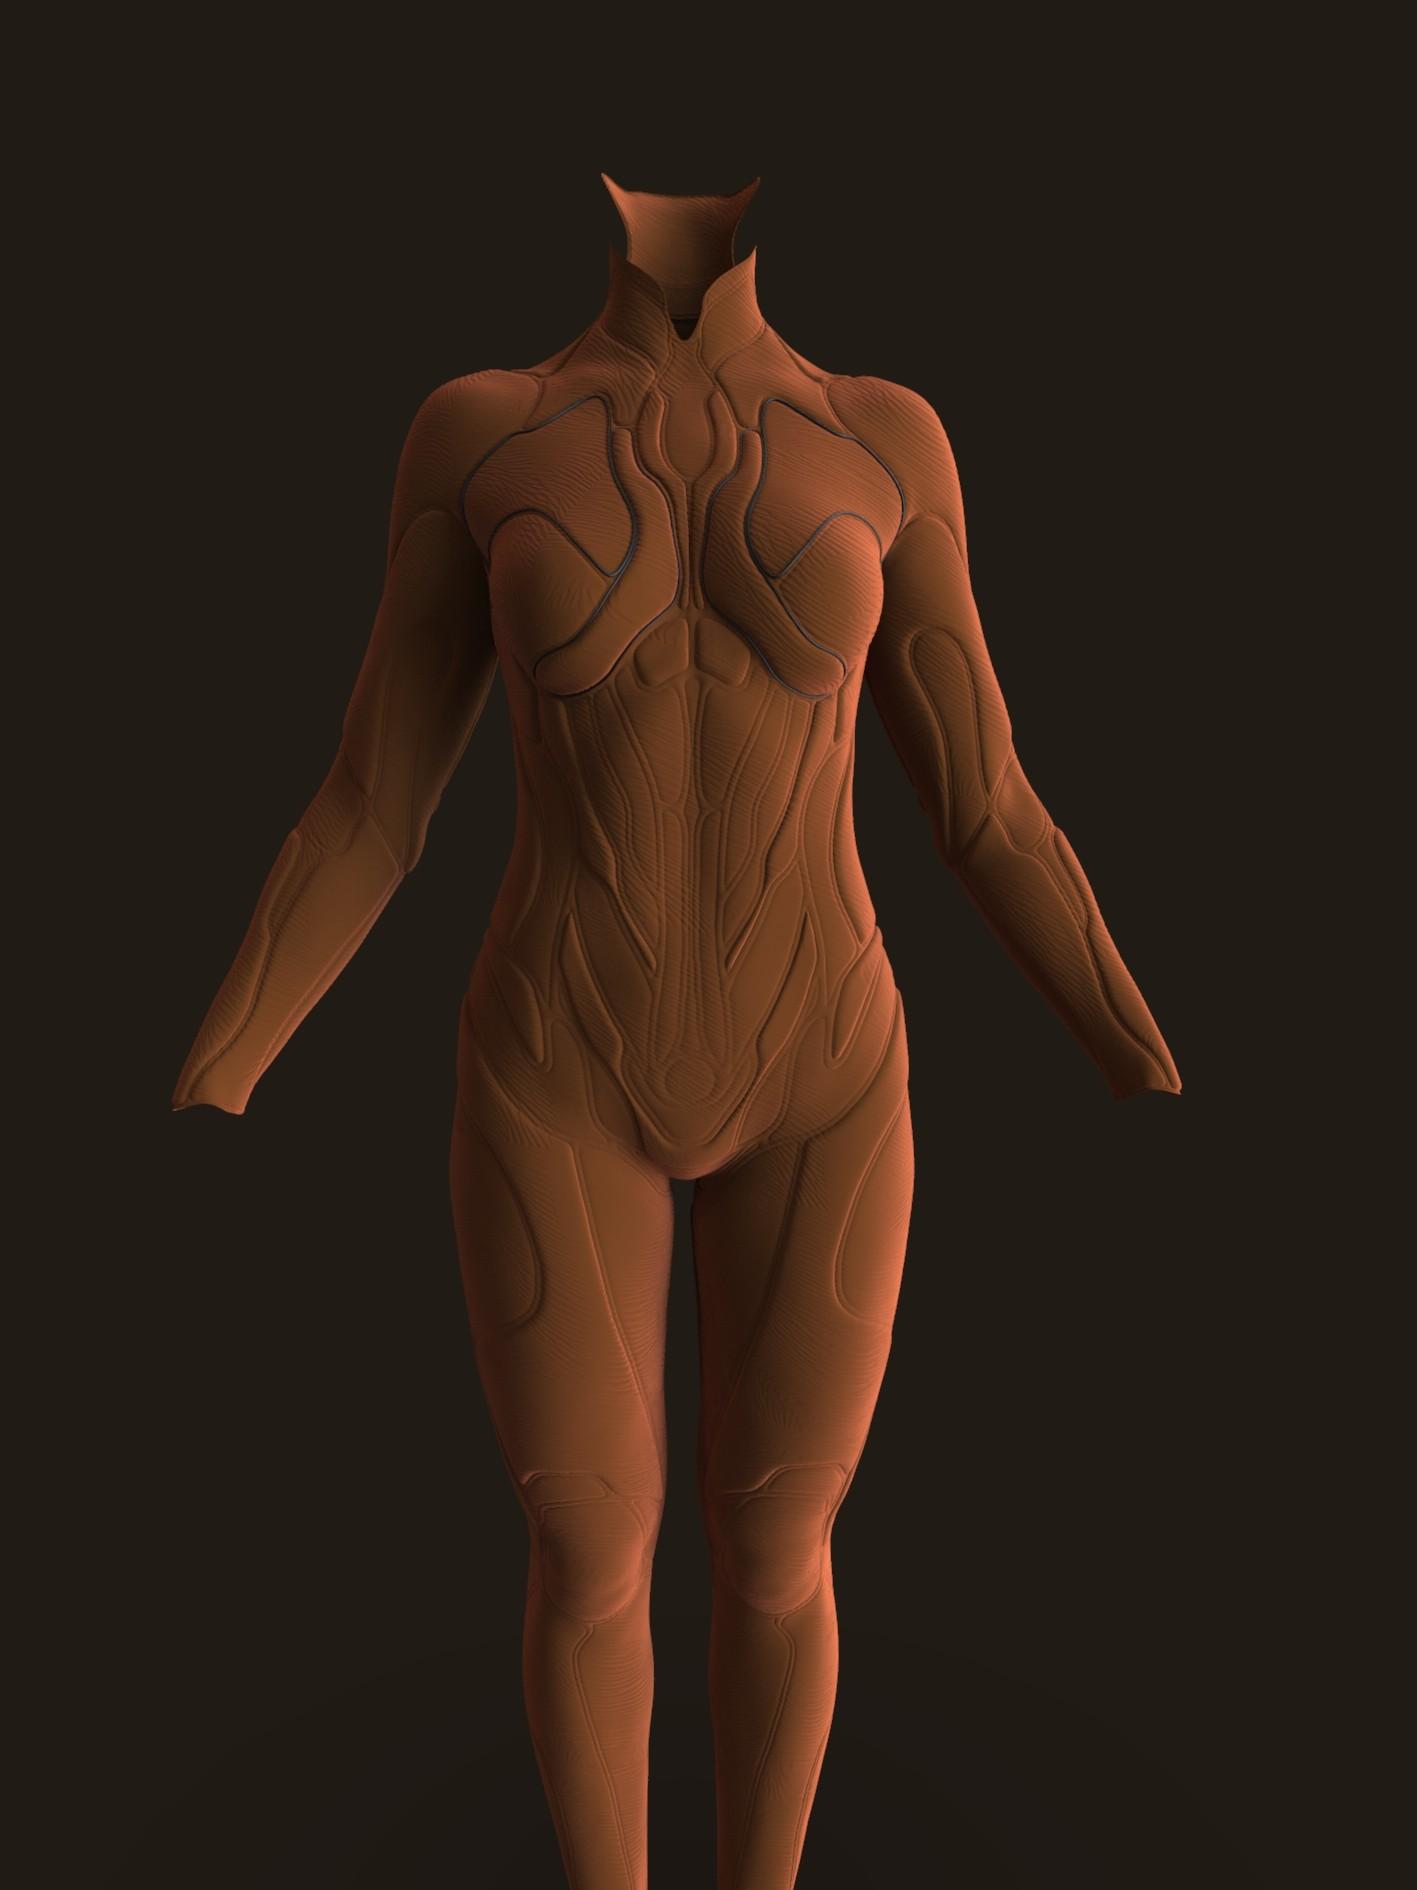 Sorin lupu dune costume v02 4513